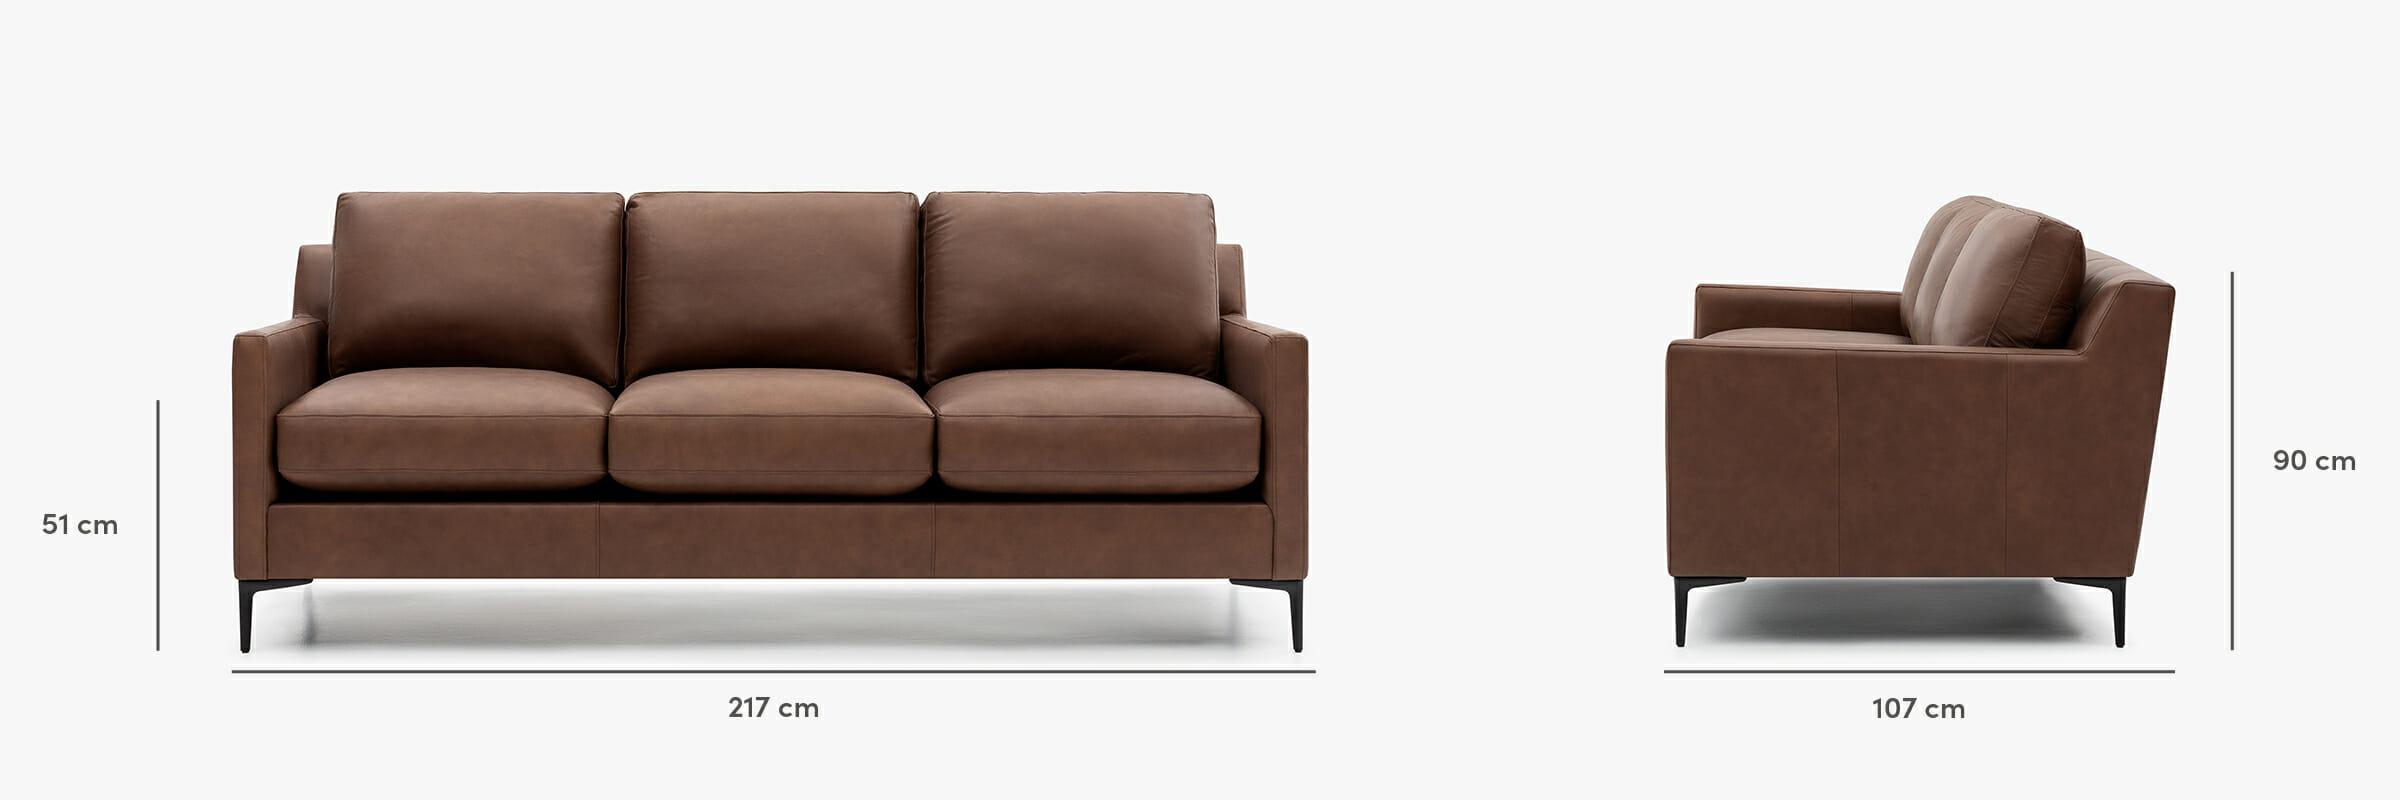 Kennedy leather sofa dimensions